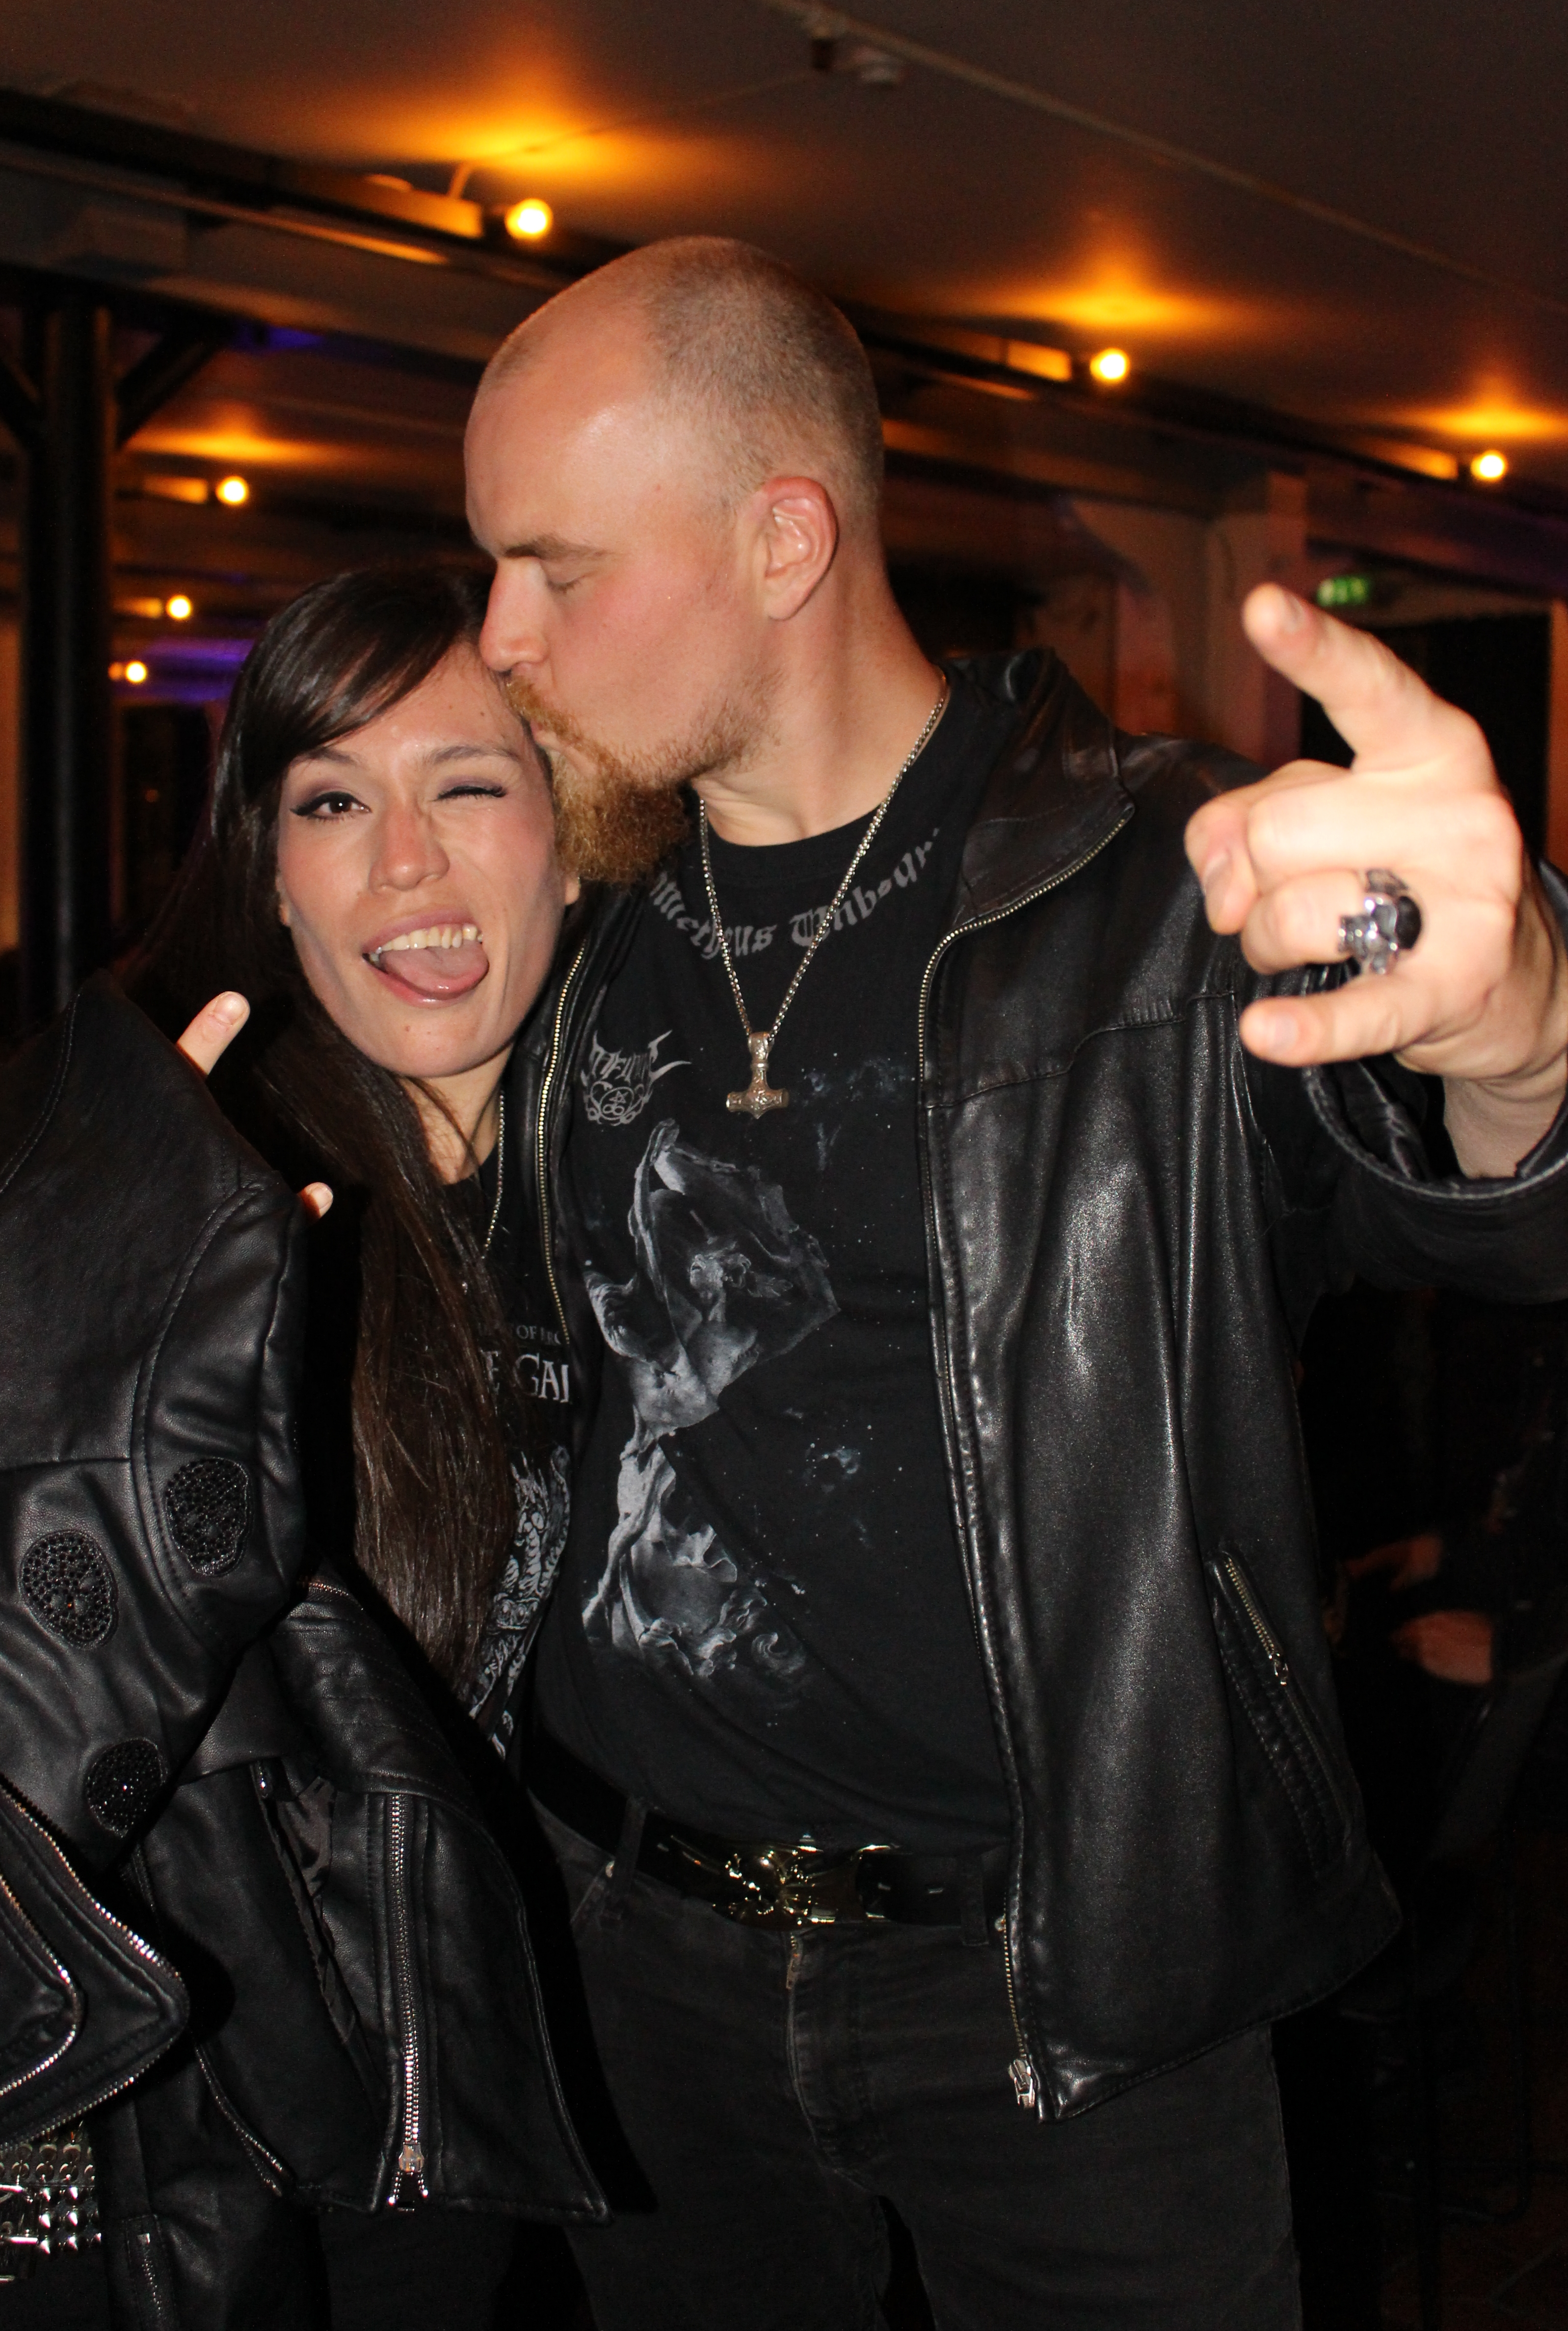 Patricia har kommet helt fra Mexico City, og poserer med den norske black metal-artisten Svartmunin (Foto: Vigdis Meidell).